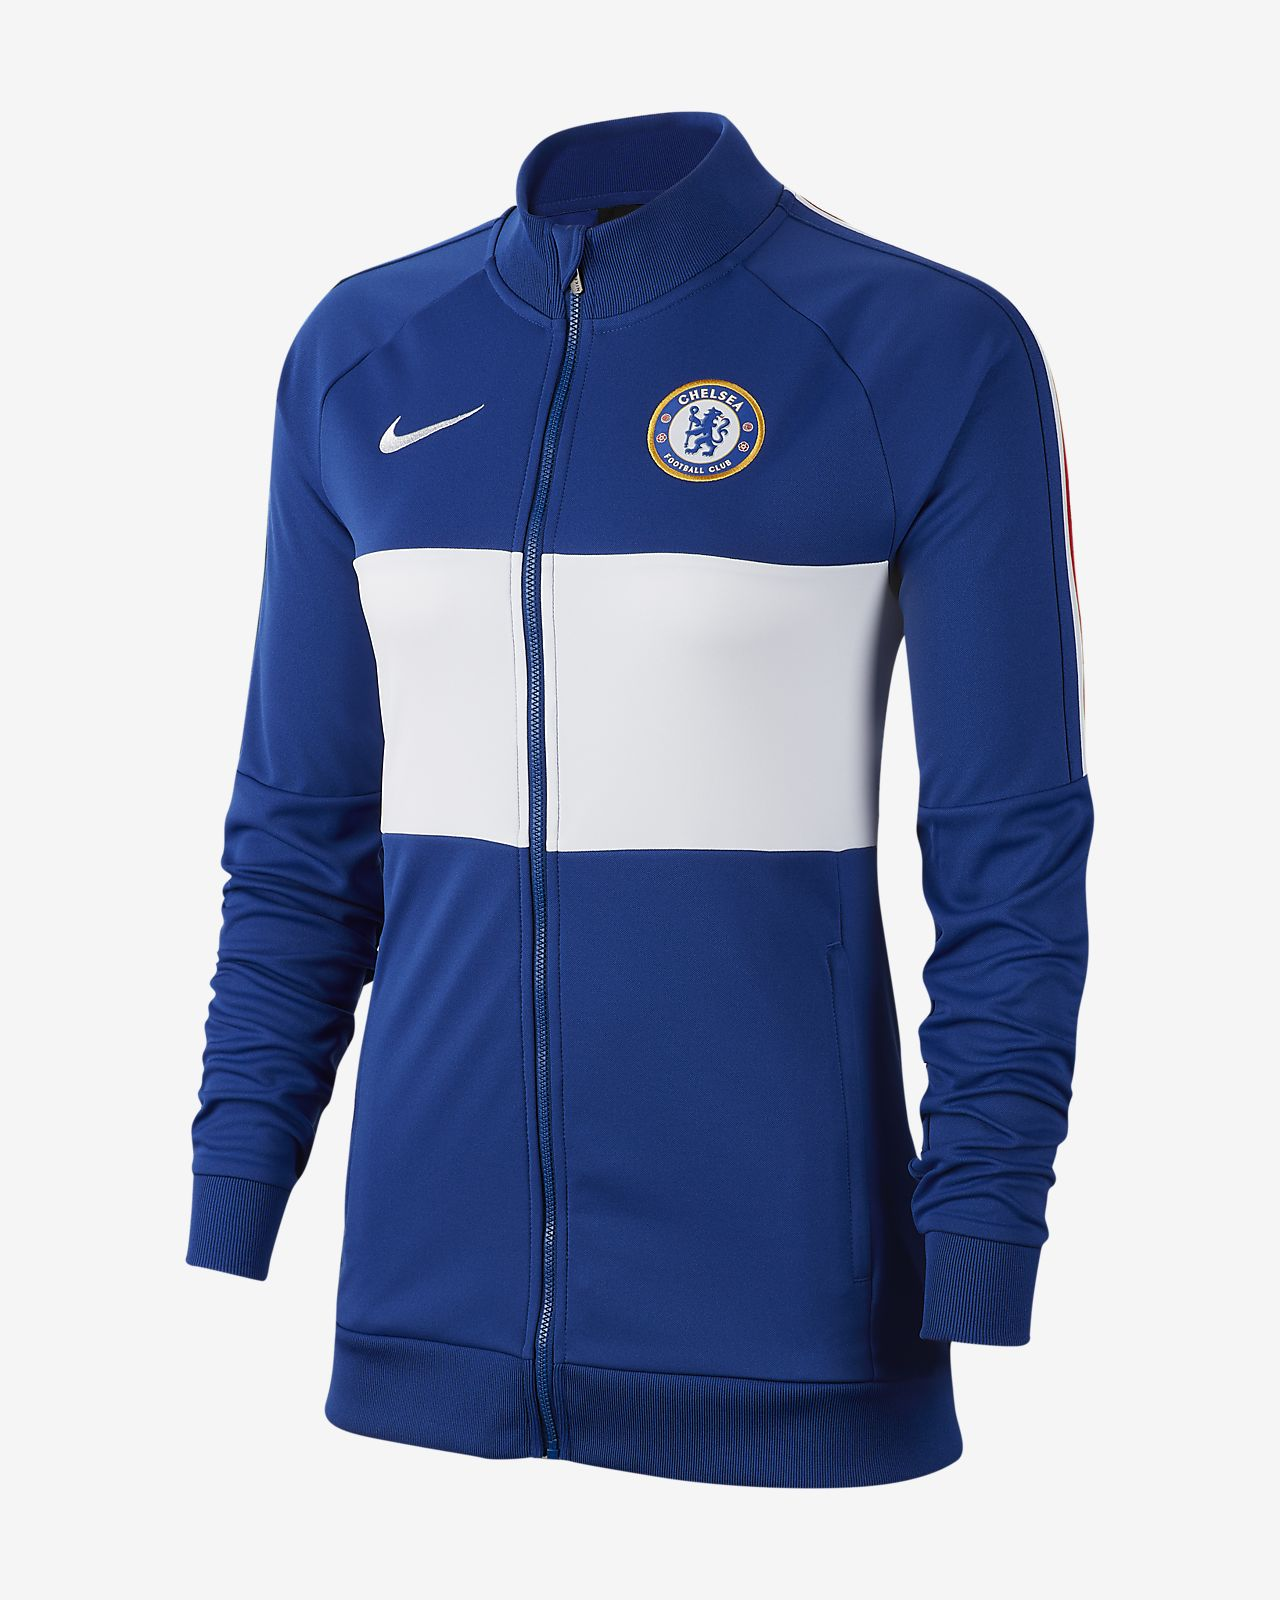 new product ff2d6 0f527 Chelsea FC Women's Jacket